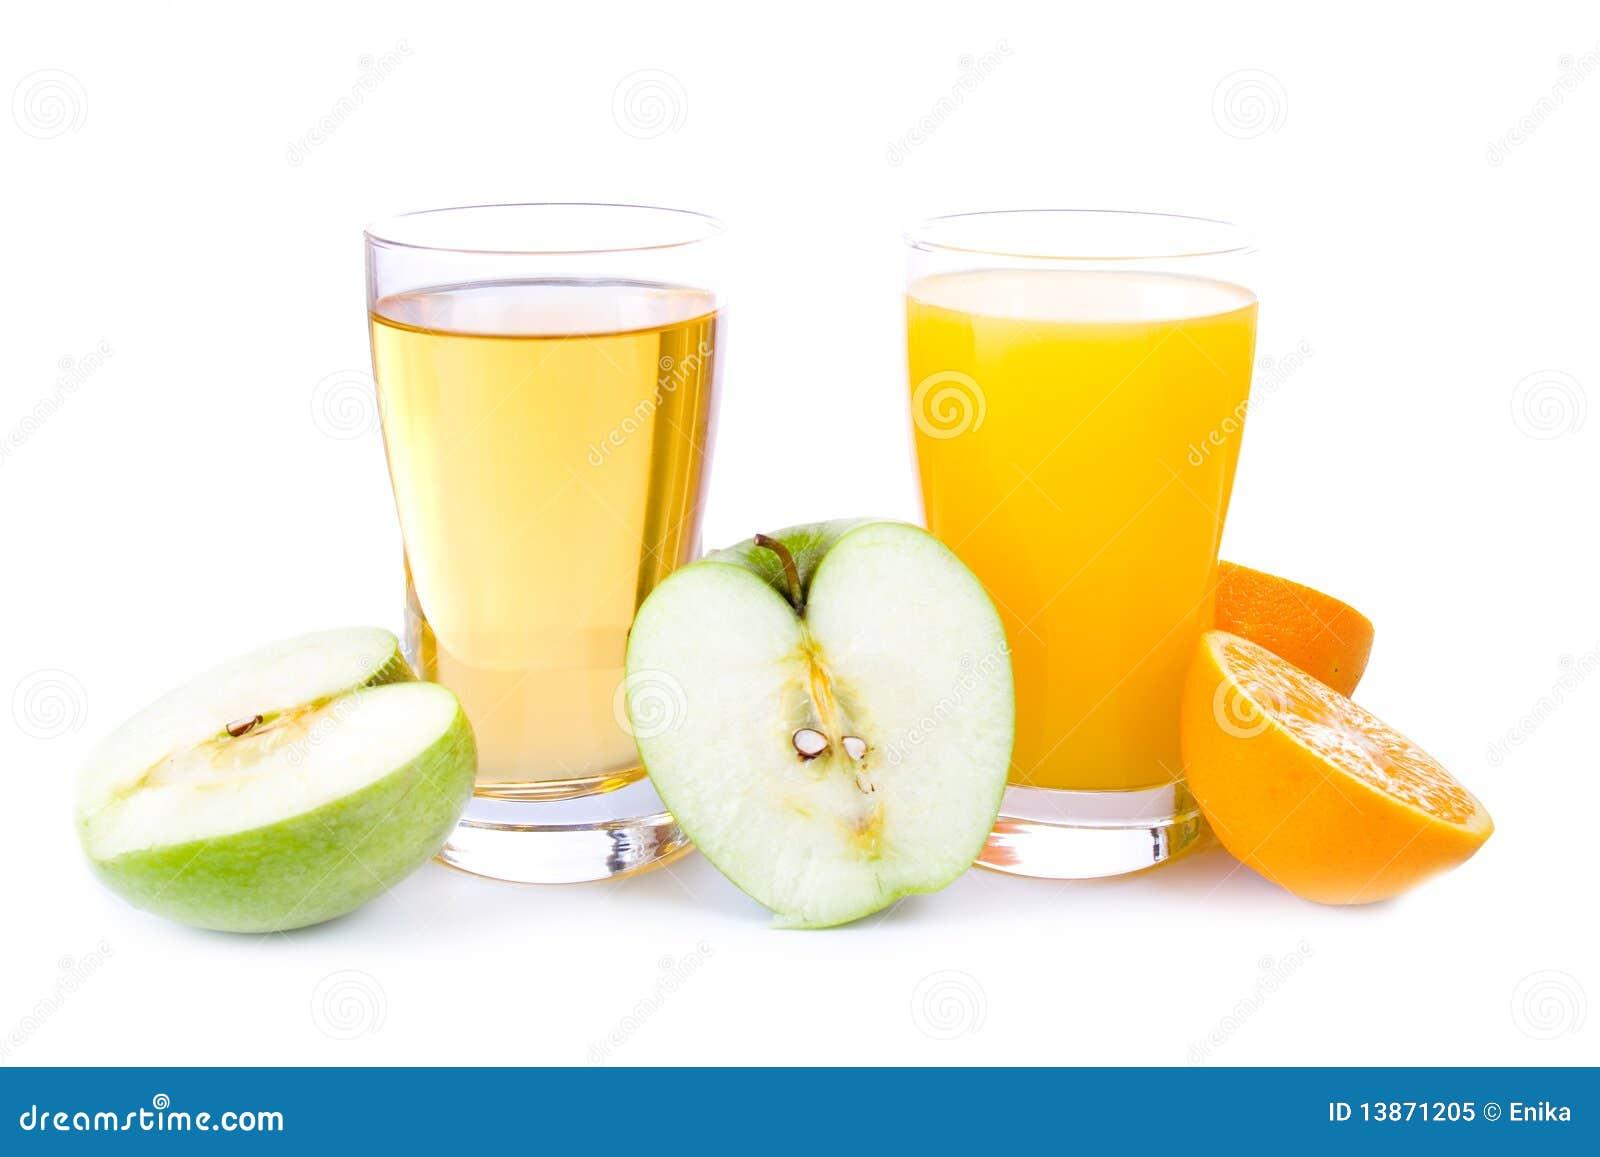 Glass Of Apple And Orange Juice Royalty Free Stock Photo - Image: 13871205